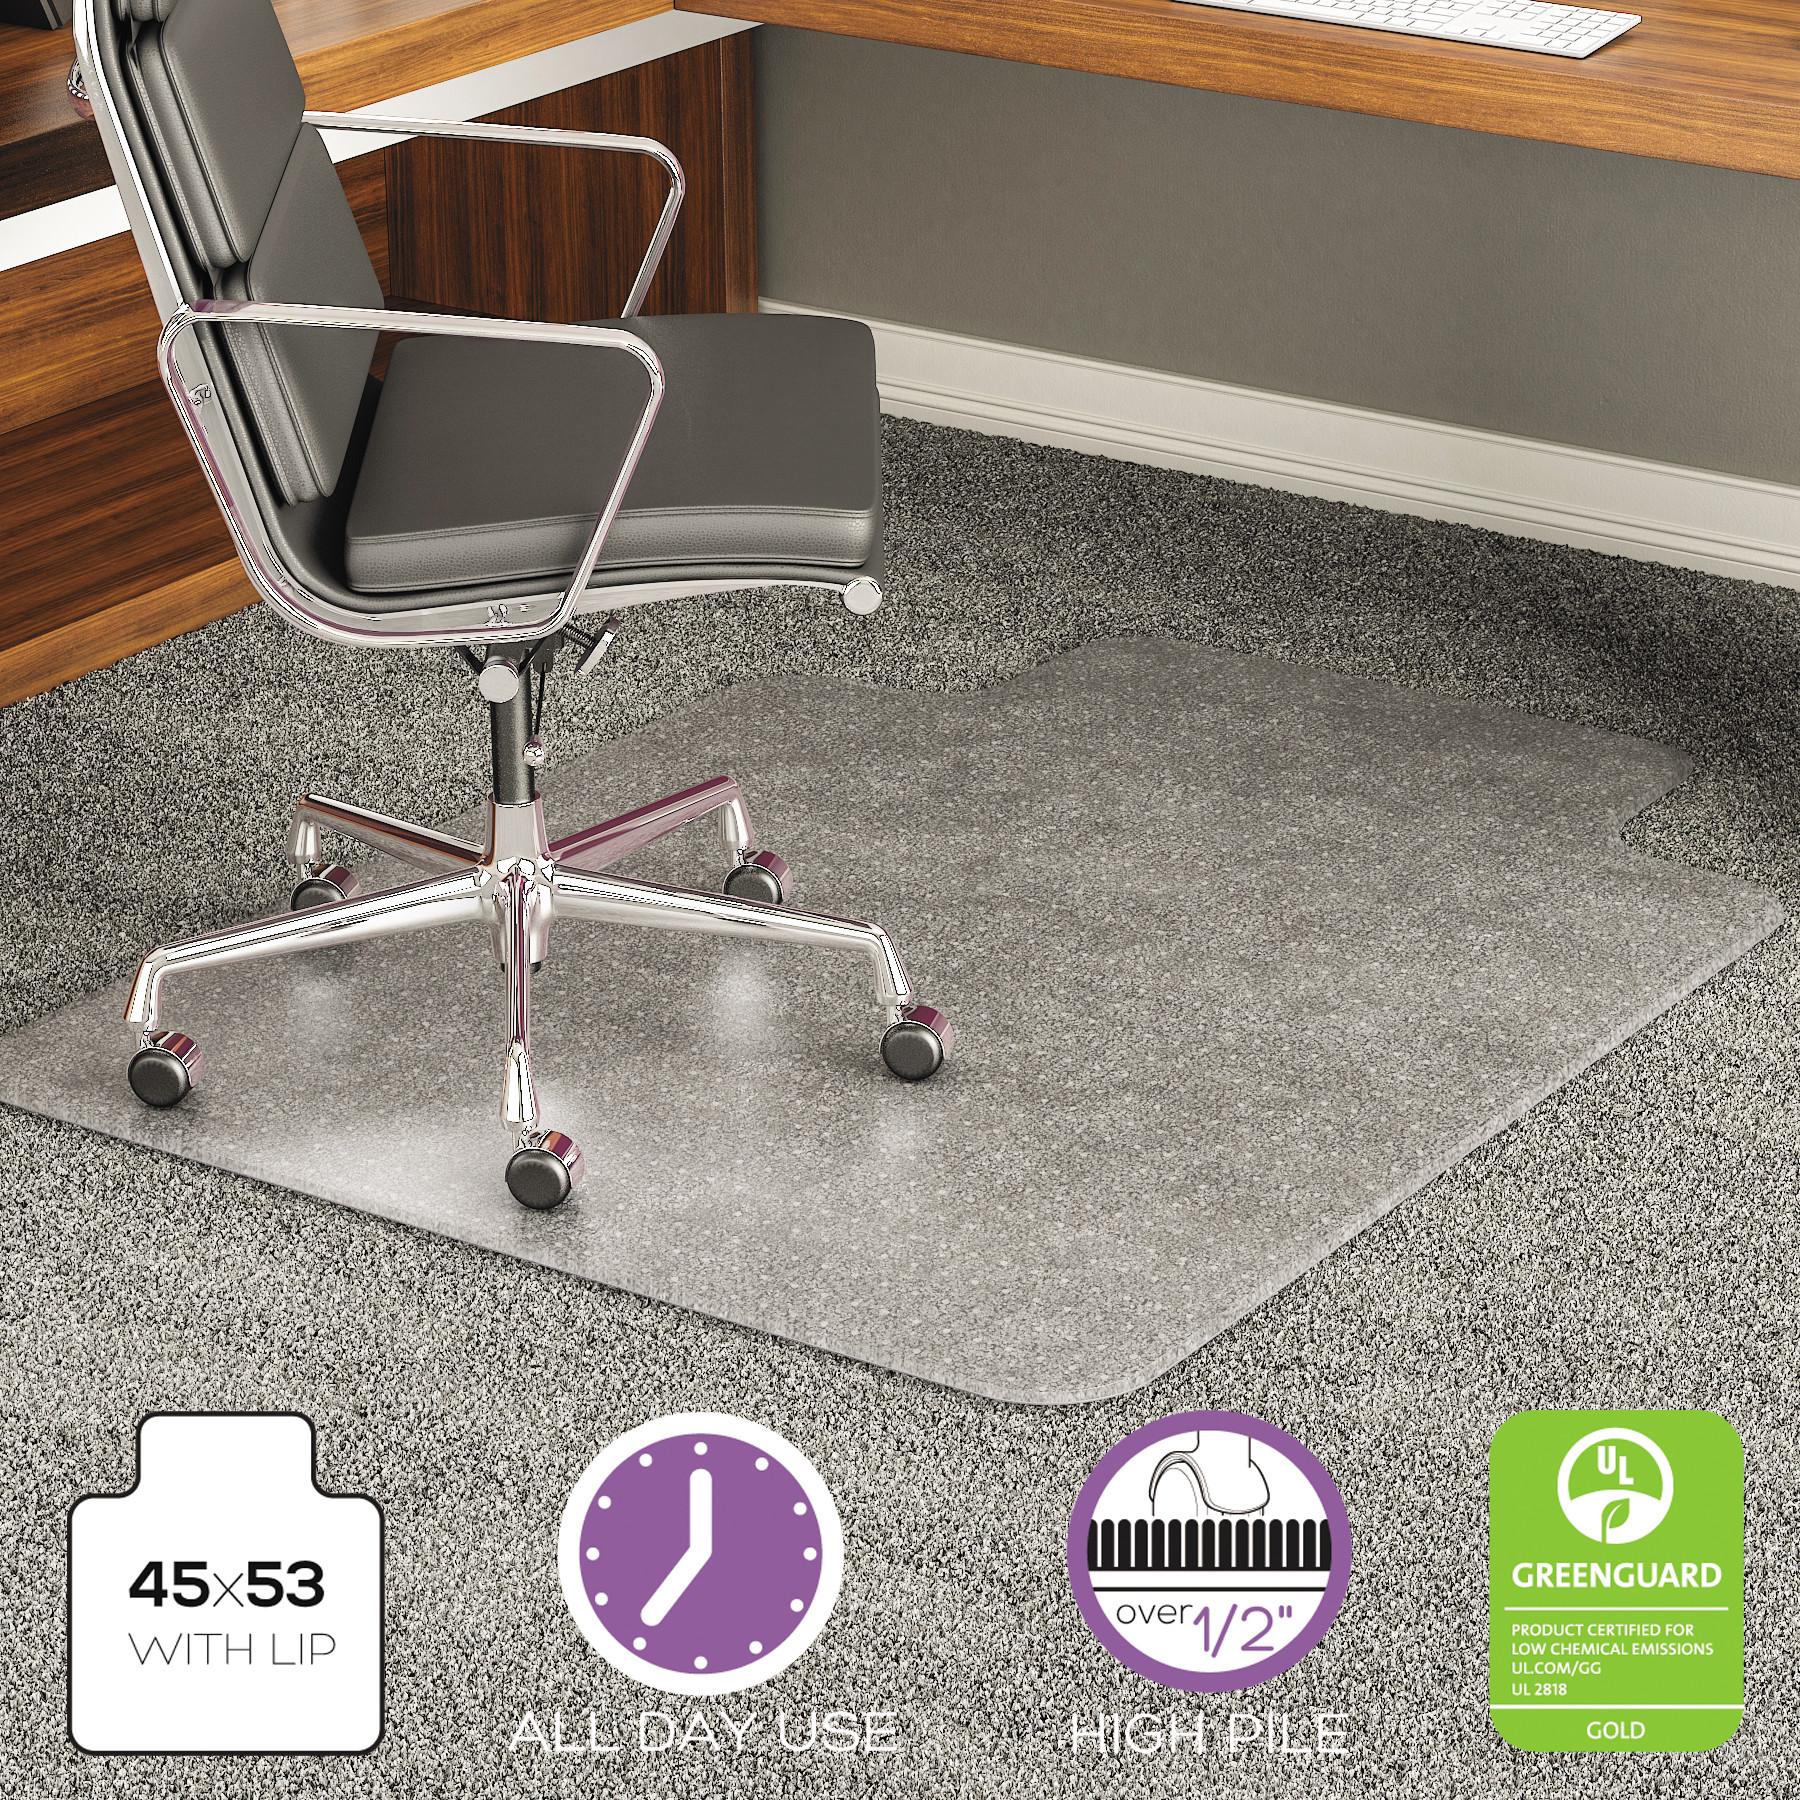 desk chair mat for high pile carpet cover rentals boston deflecto execumat 45 x 53 rectangular with lip walmart com